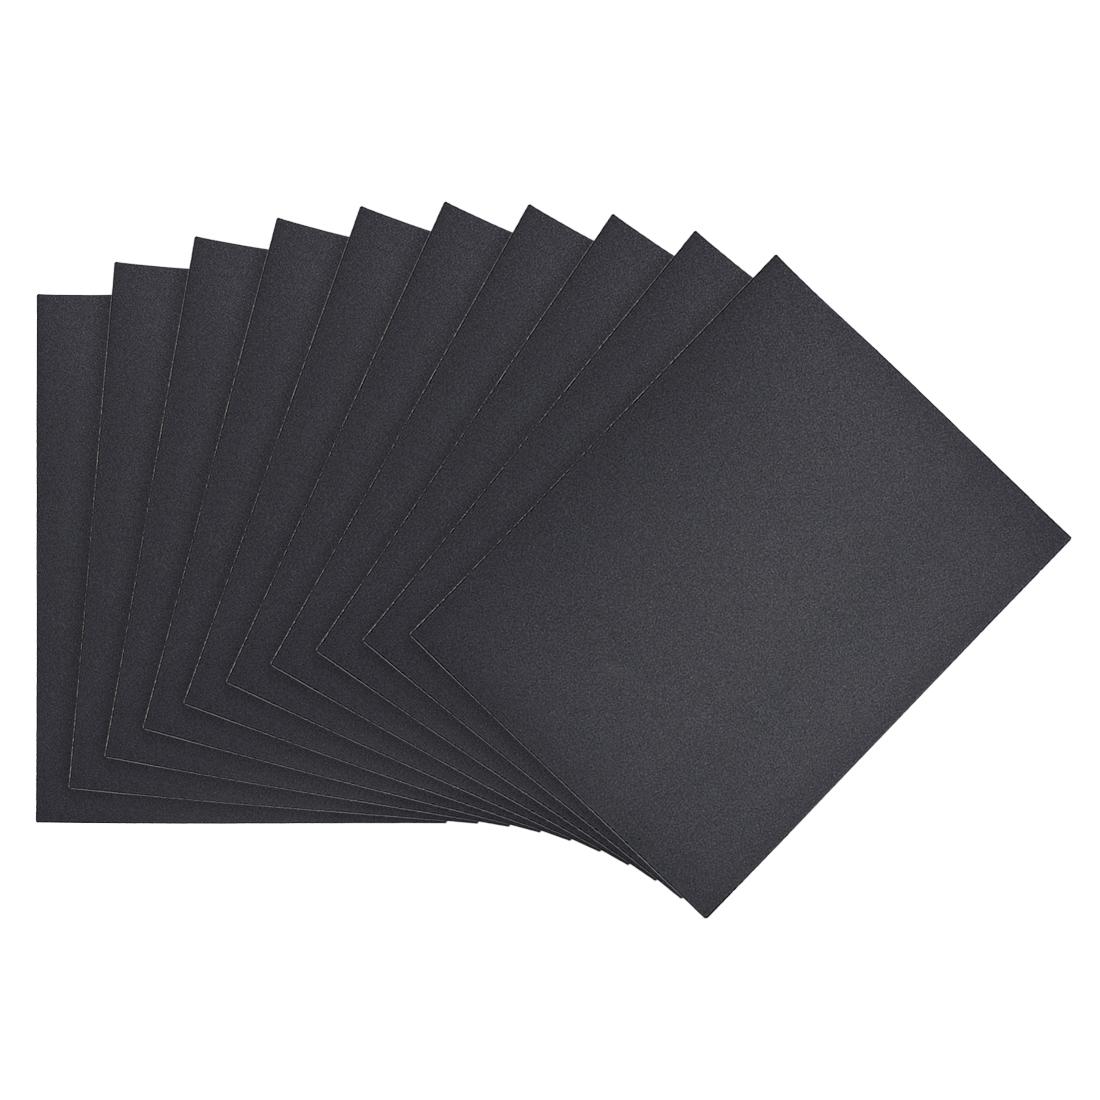 Waterproof Sandpaper, Wet Dry Sand Paper Grit of 220, 11 x 9inch 10pcs